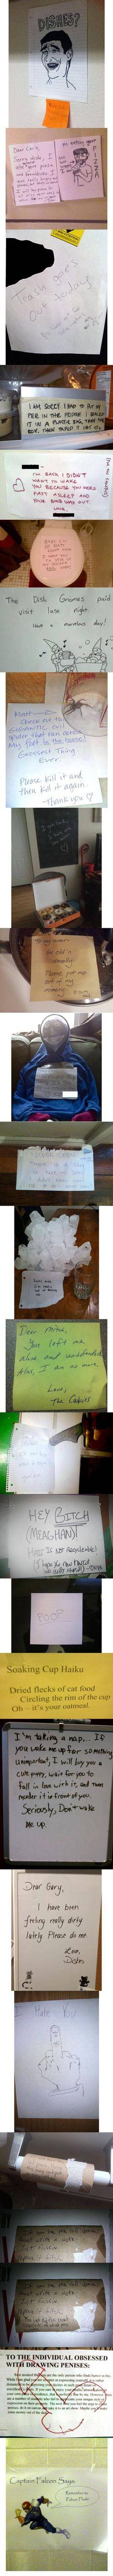 oh roommates :) @Keri Seamon remember these days??